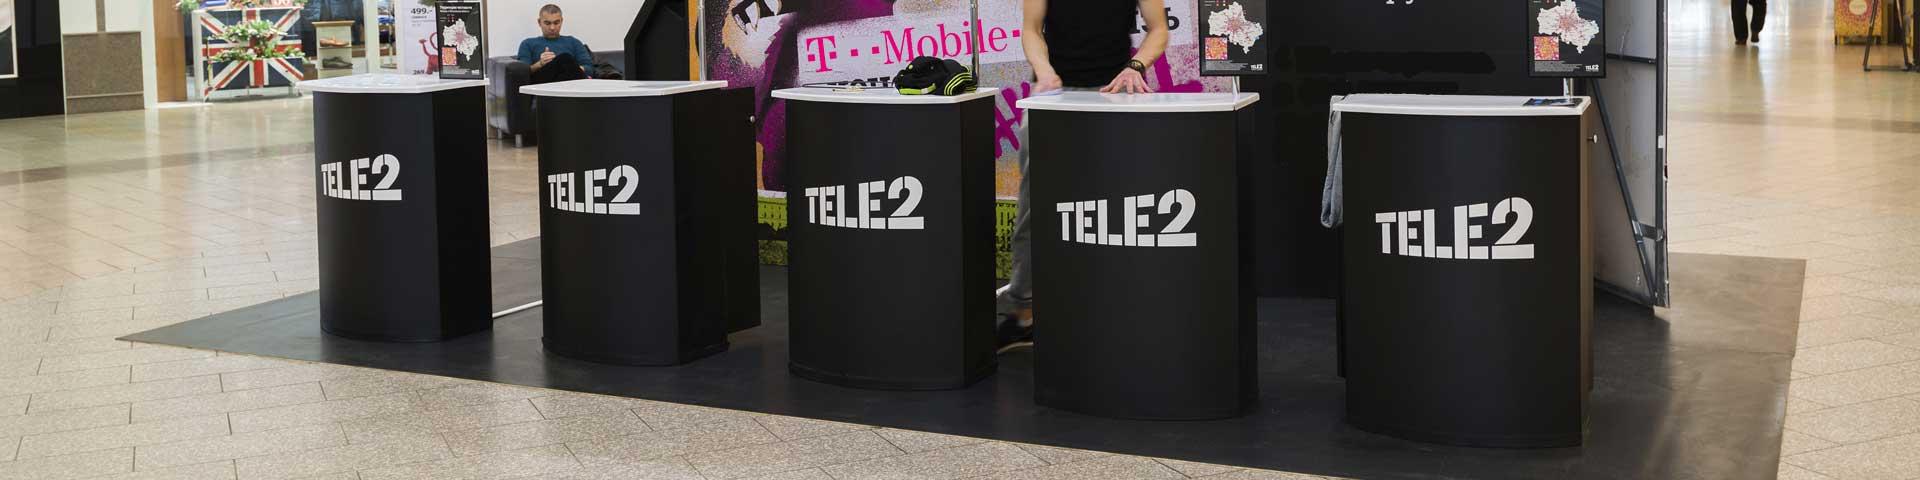 Tele2 abonnementen worden T Mobile